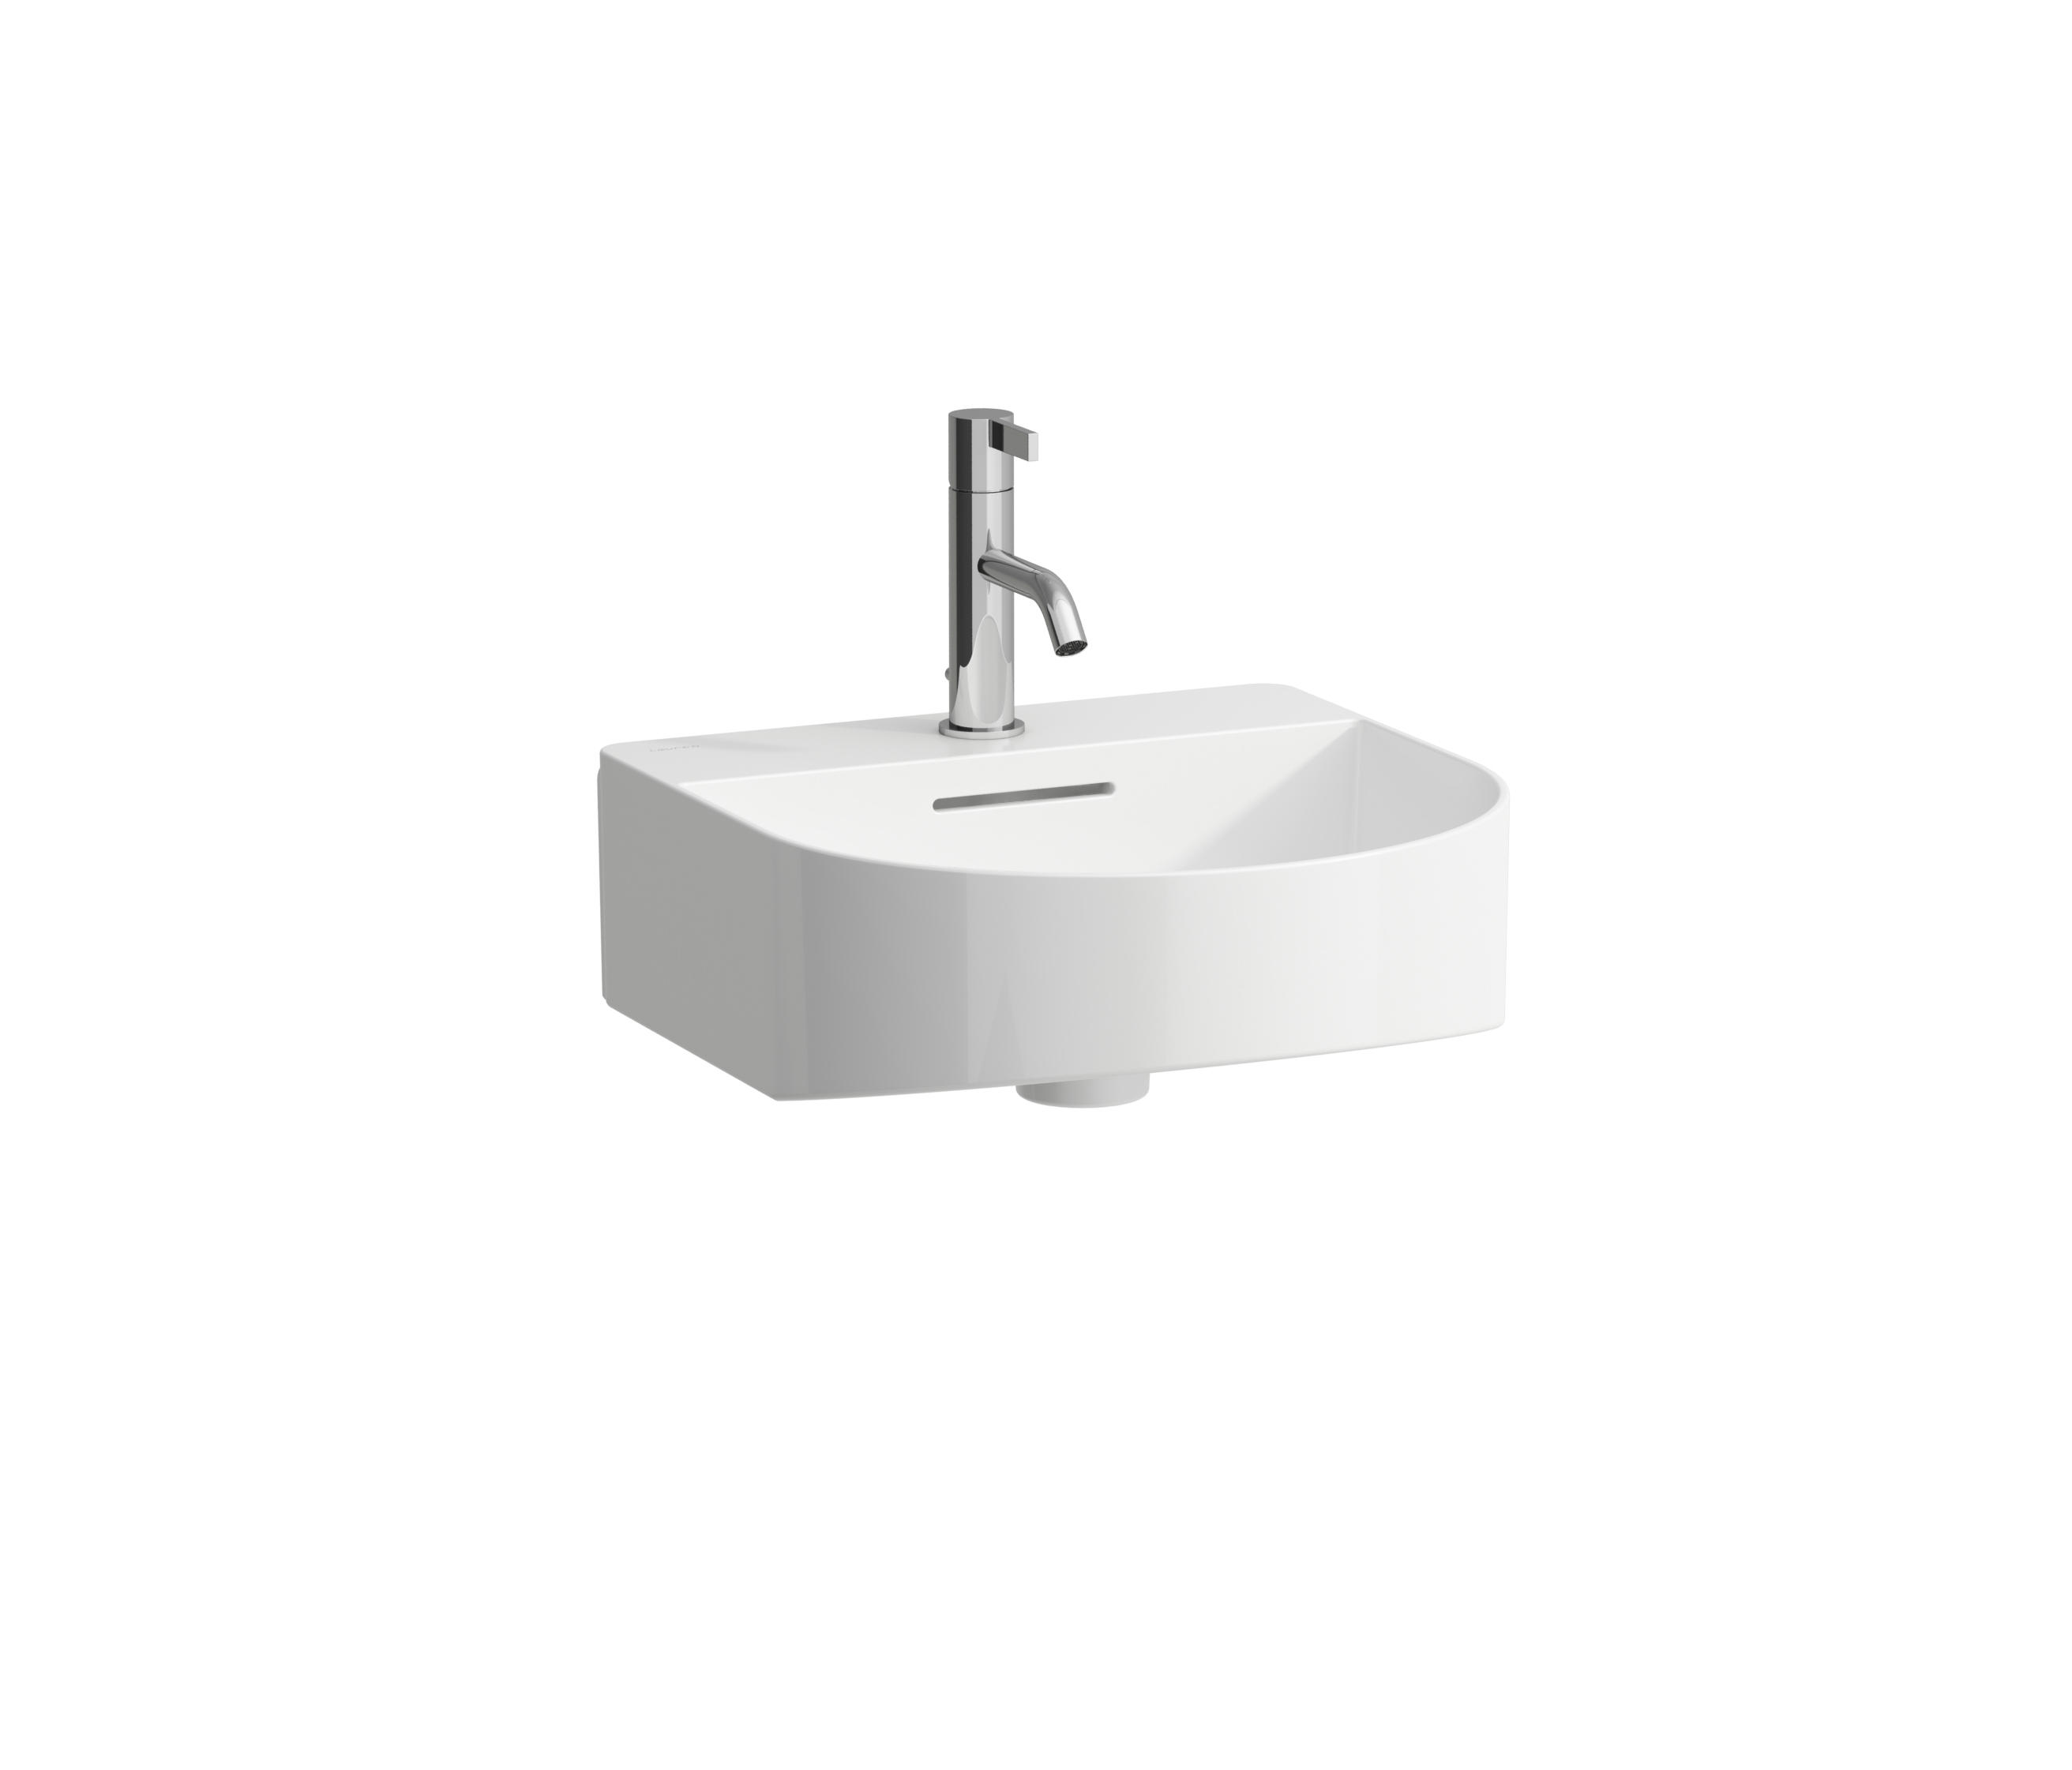 SONAR | SMALL WASHBASIN - Wash basins from Laufen | Architonic